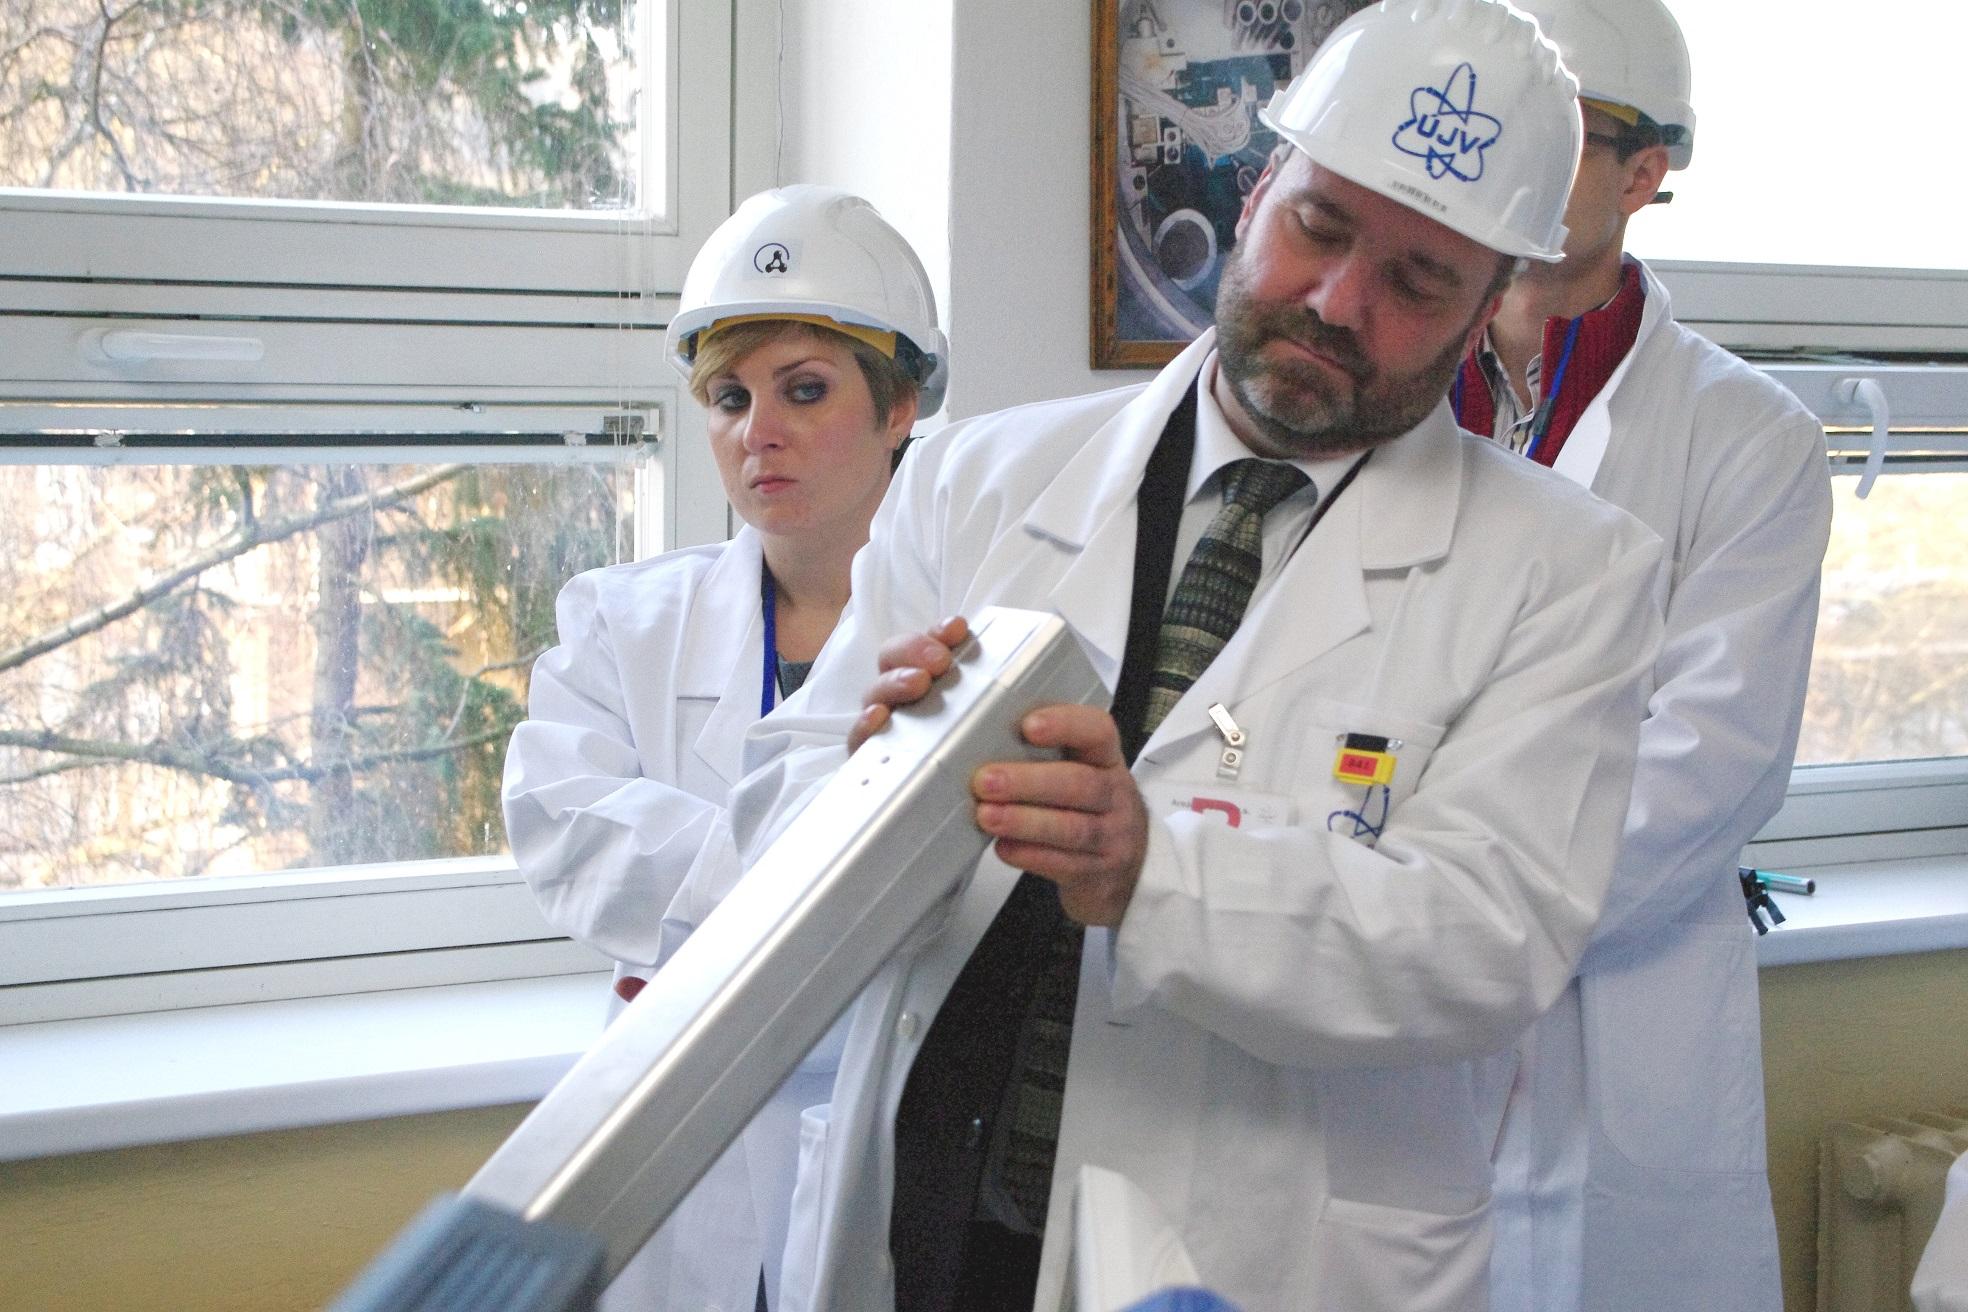 Bezpečnost jaderné energetiky je prioritou ÚJV Řež